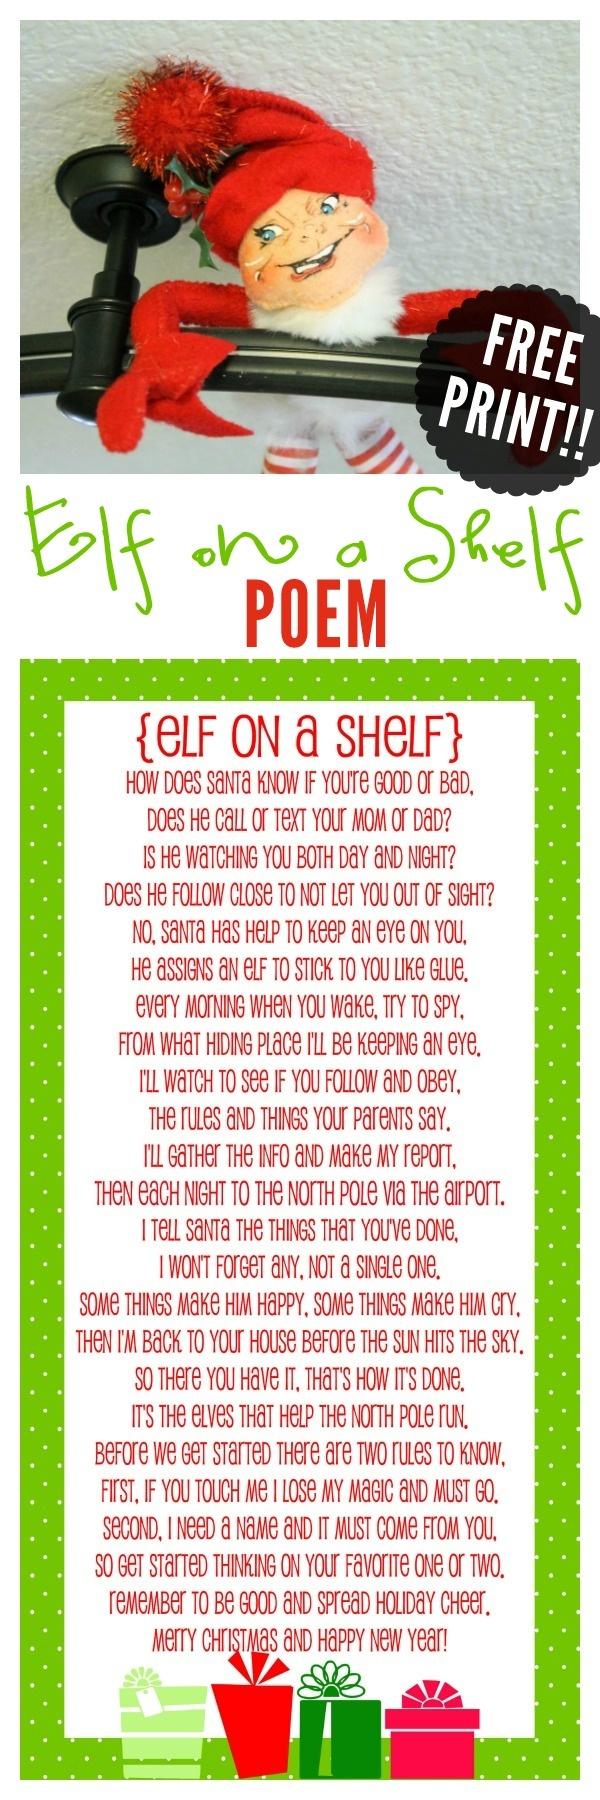 Elf On The Shelf Story - Free Printable Poem | Christmas Help | Elf - Free Printable Elf On The Shelf Story